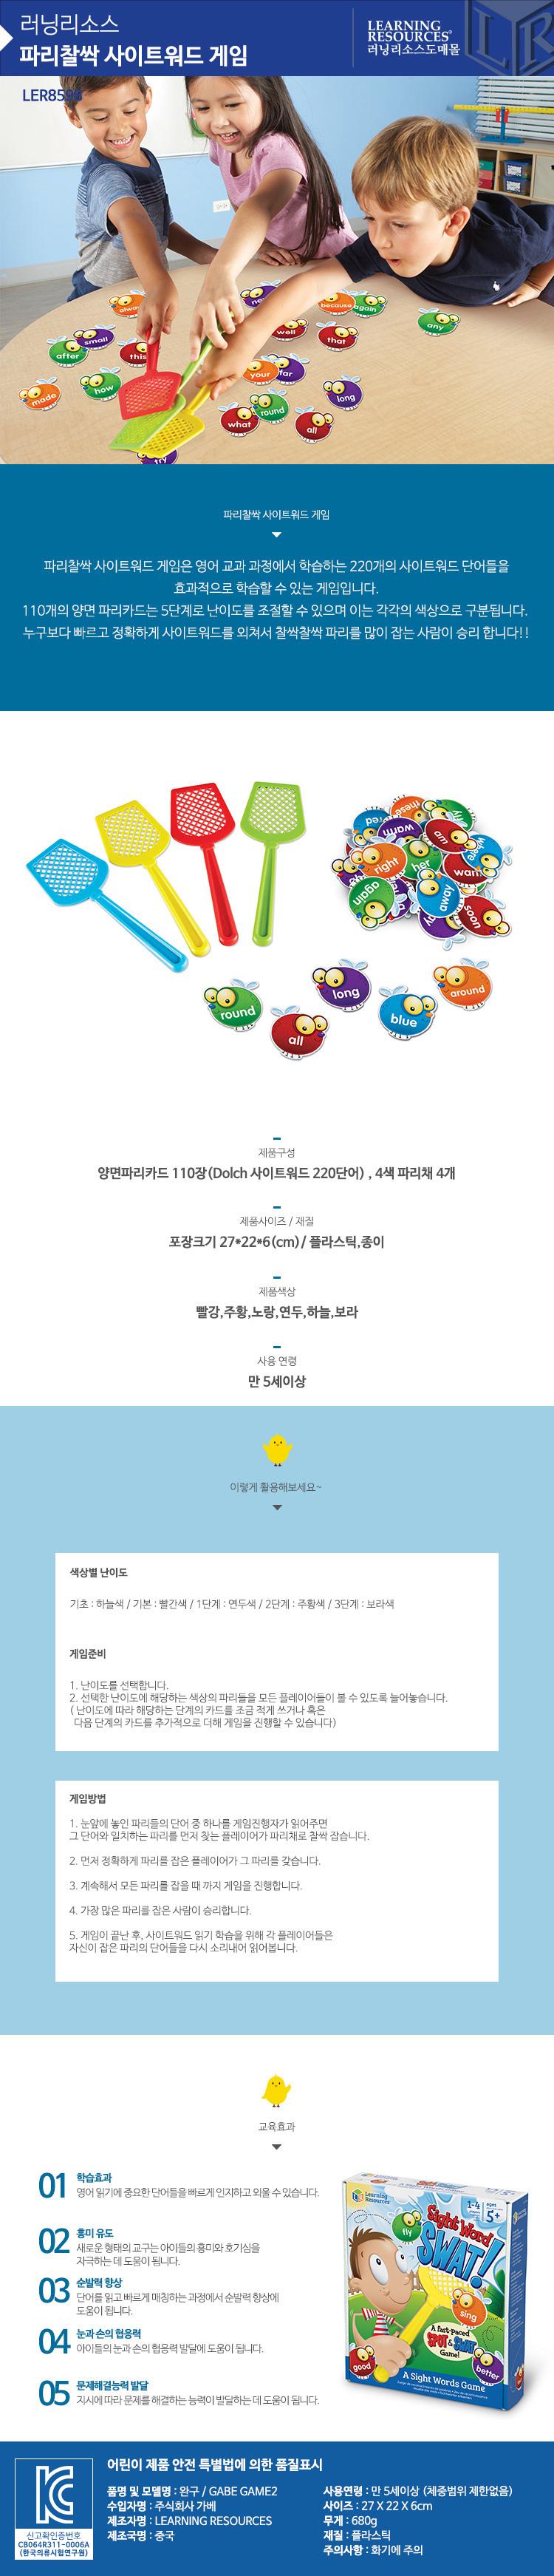 LER8598 파리찰싹 사이트워드 게임 - 에듀케셔널인사이츠, 23,200원, 교육완구, 교육완구